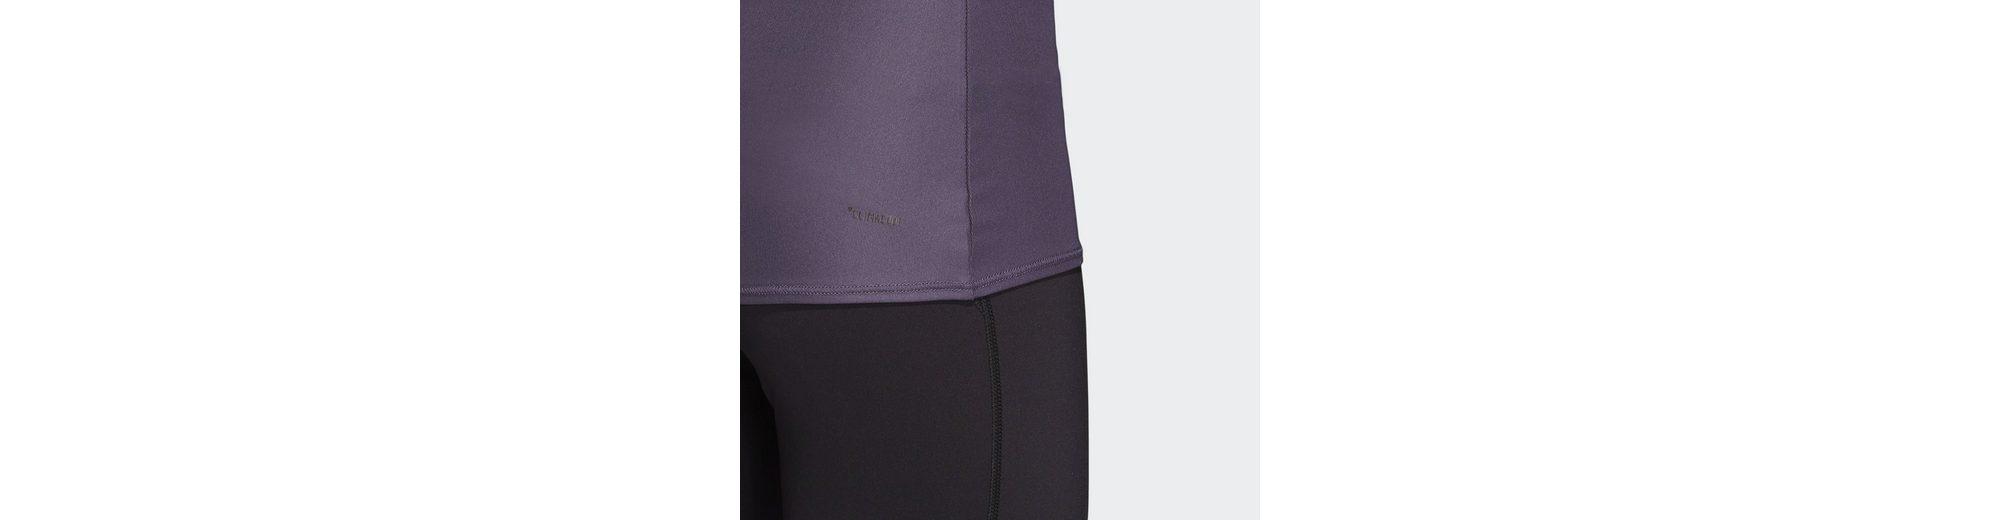 Performance T Sporttop Shirt adidas Performance adidas 8w1Uq46